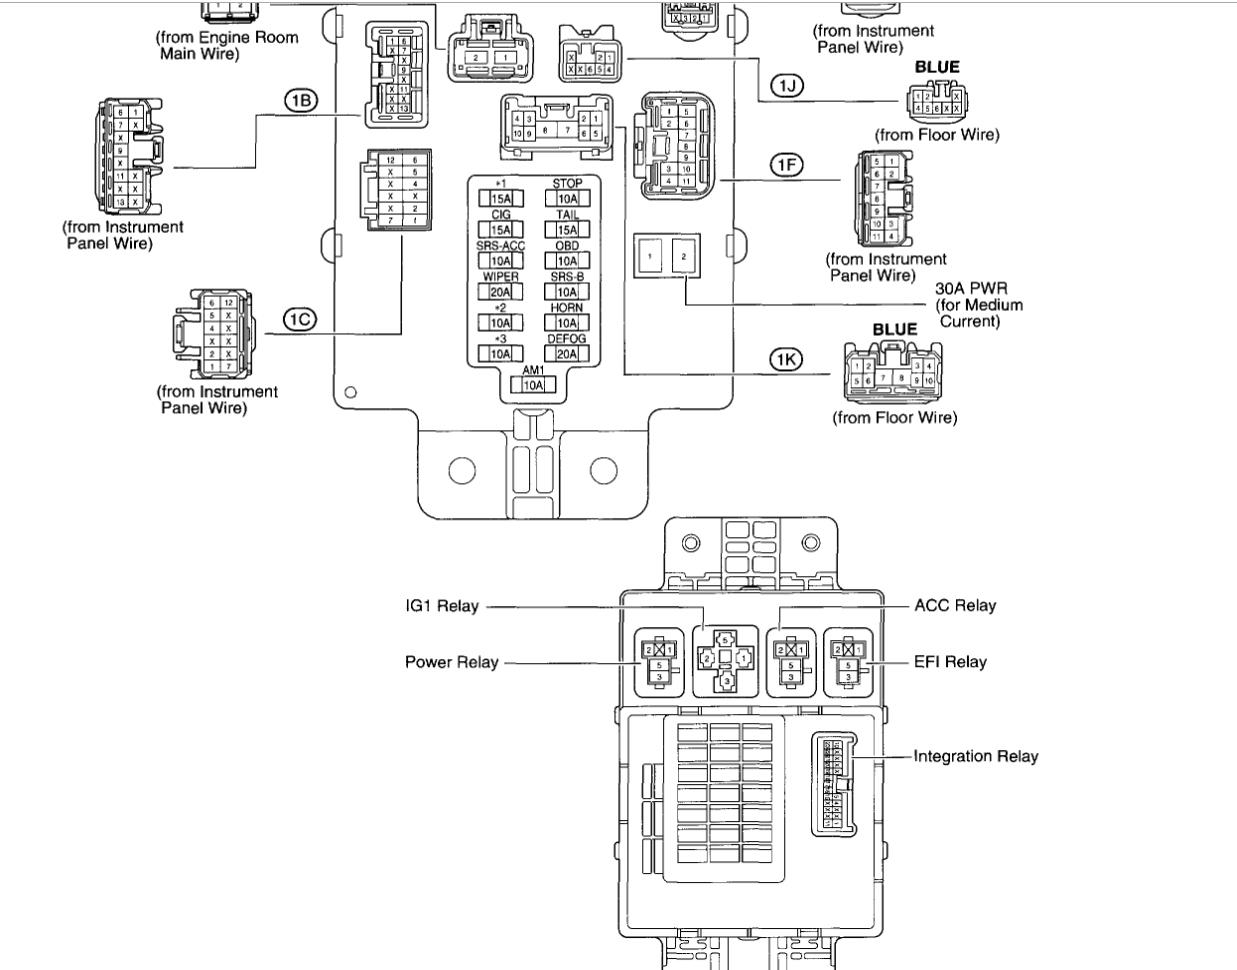 Toyota Rav4 Fuse Box Location